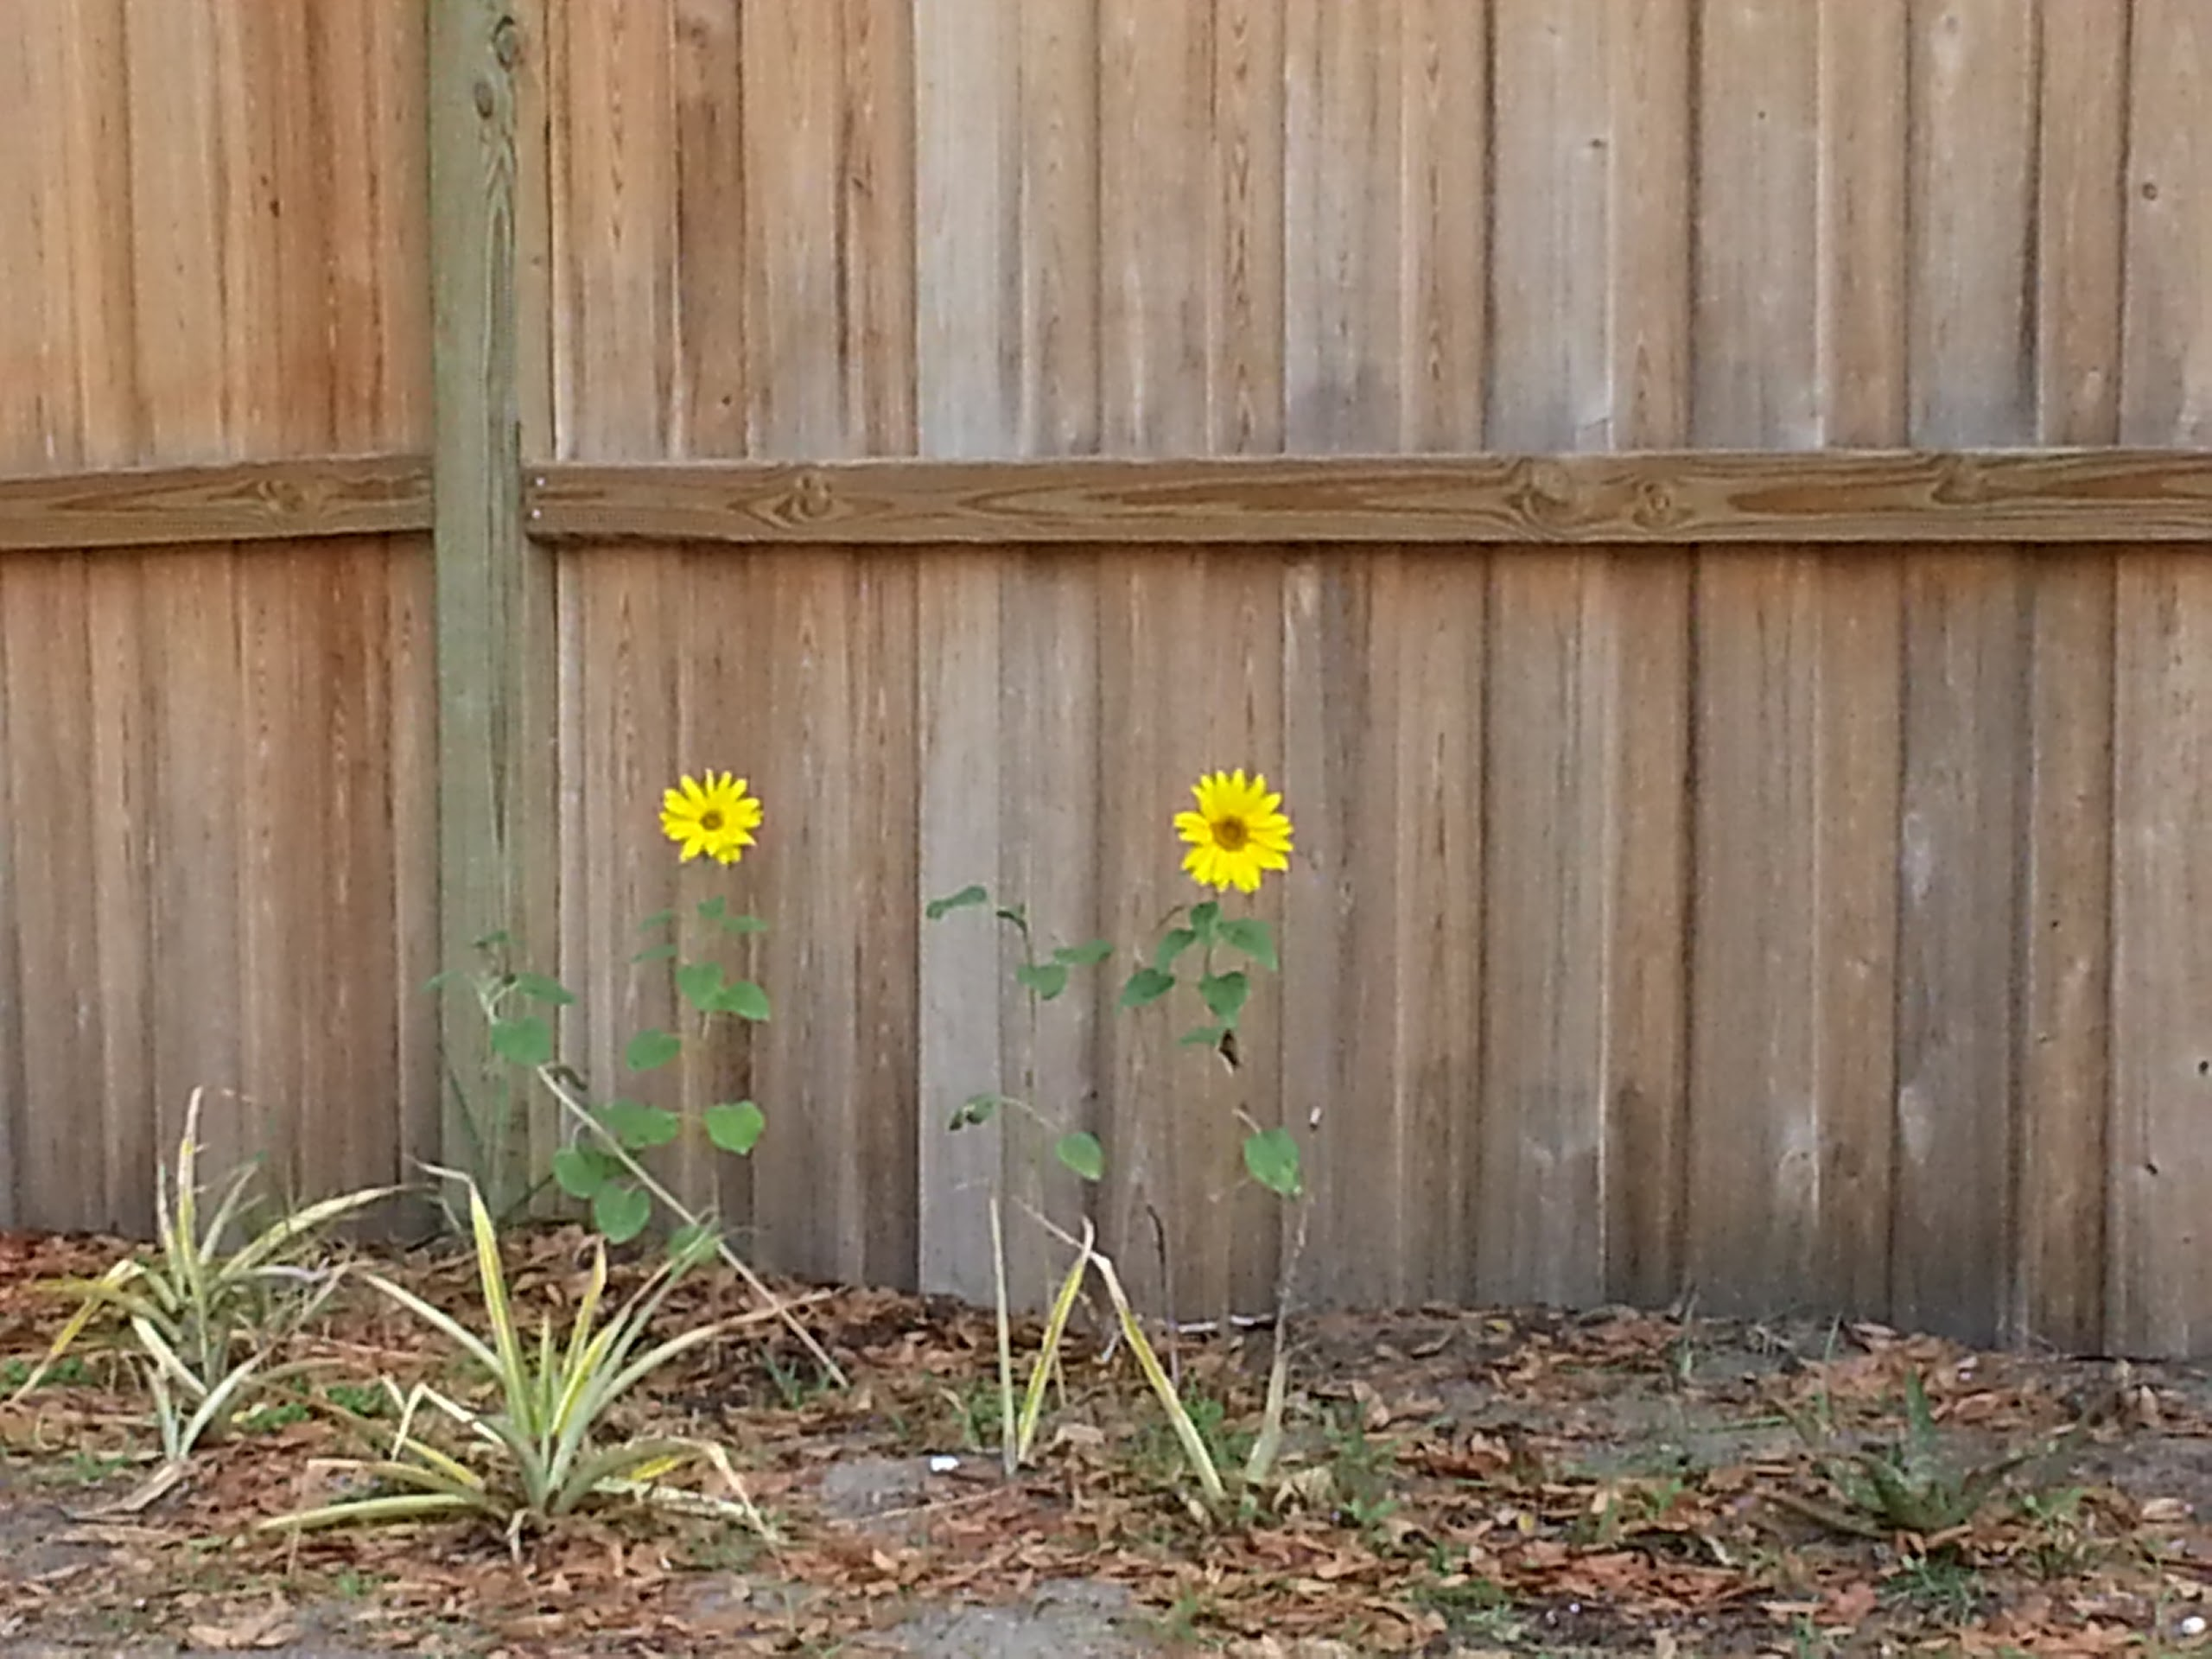 My garden and Aerogardens: March 2013